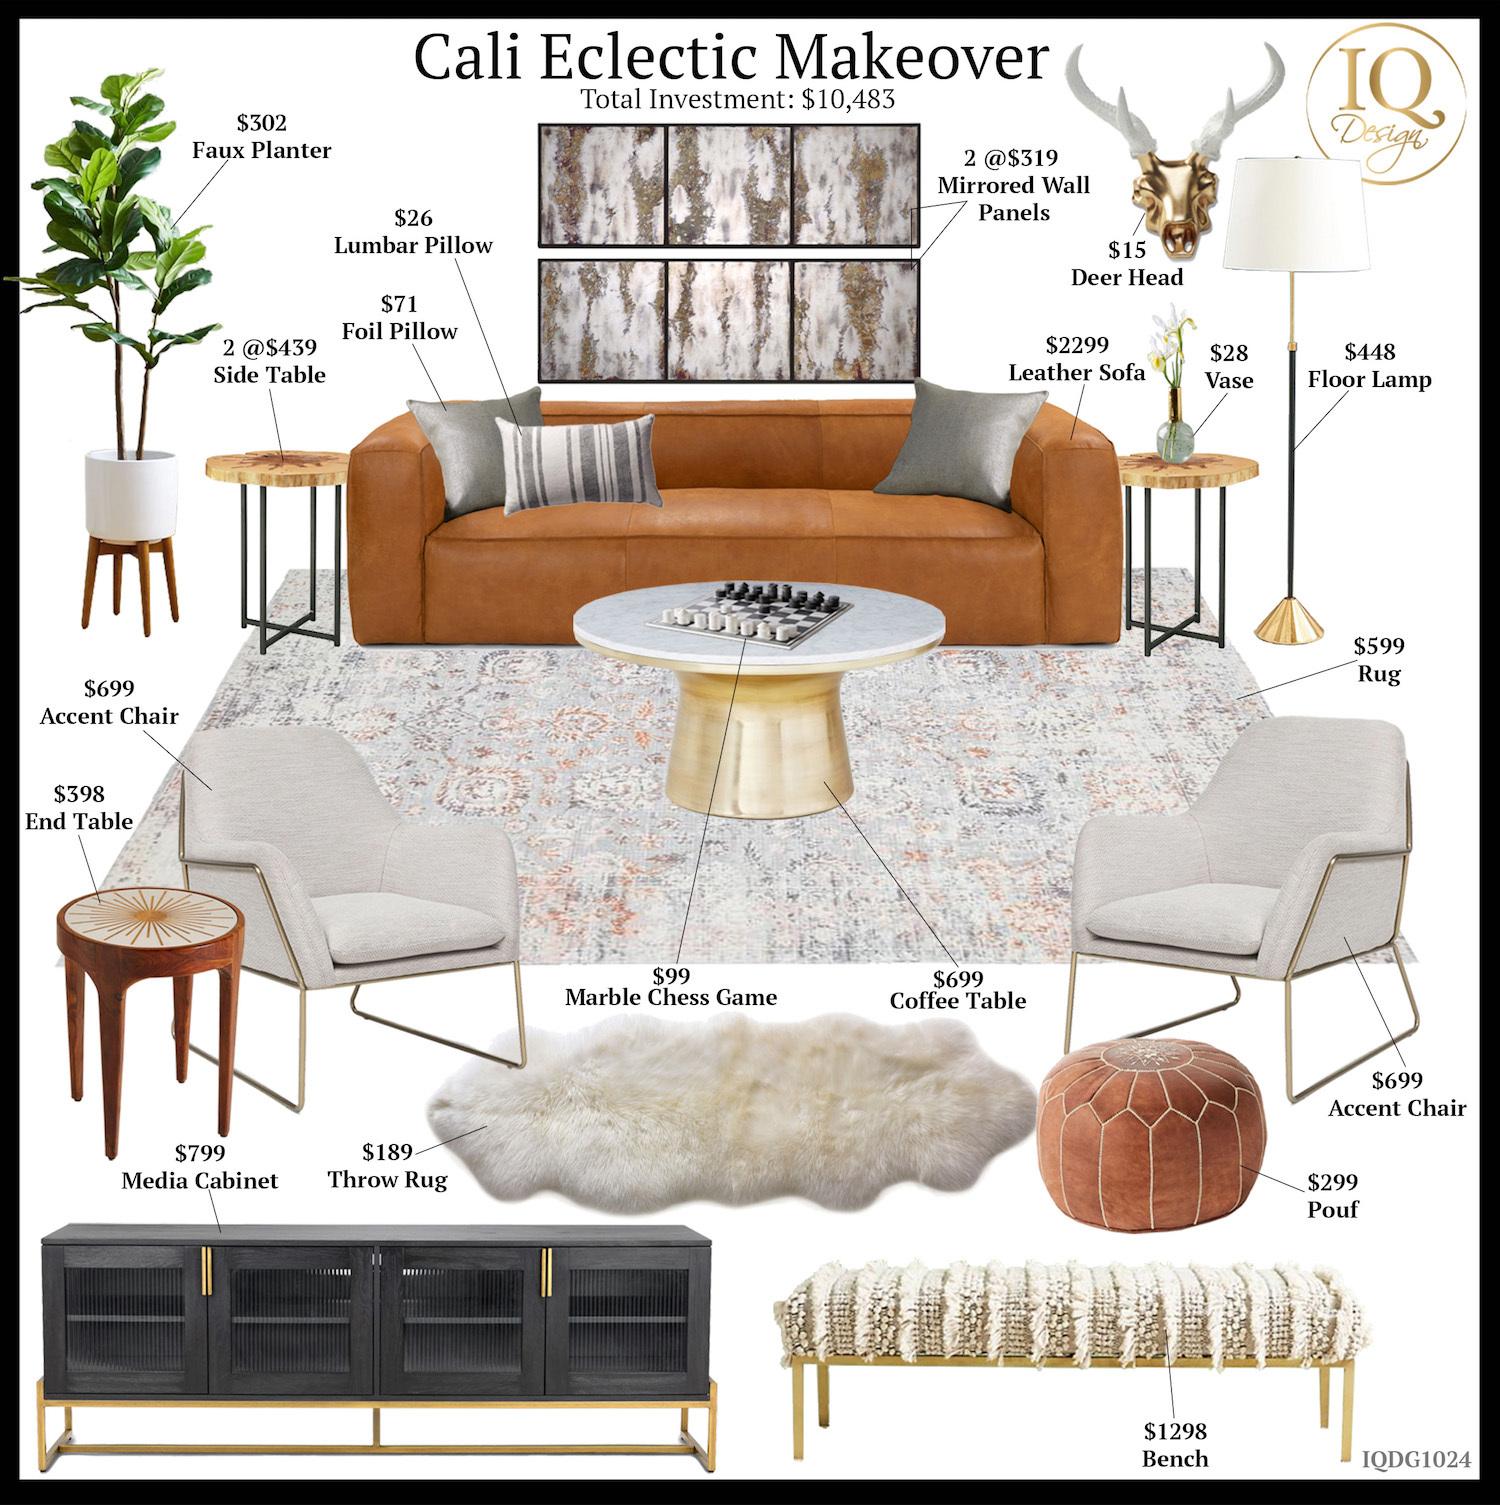 IQDG1024_10K Airbnb Living Room.jpg